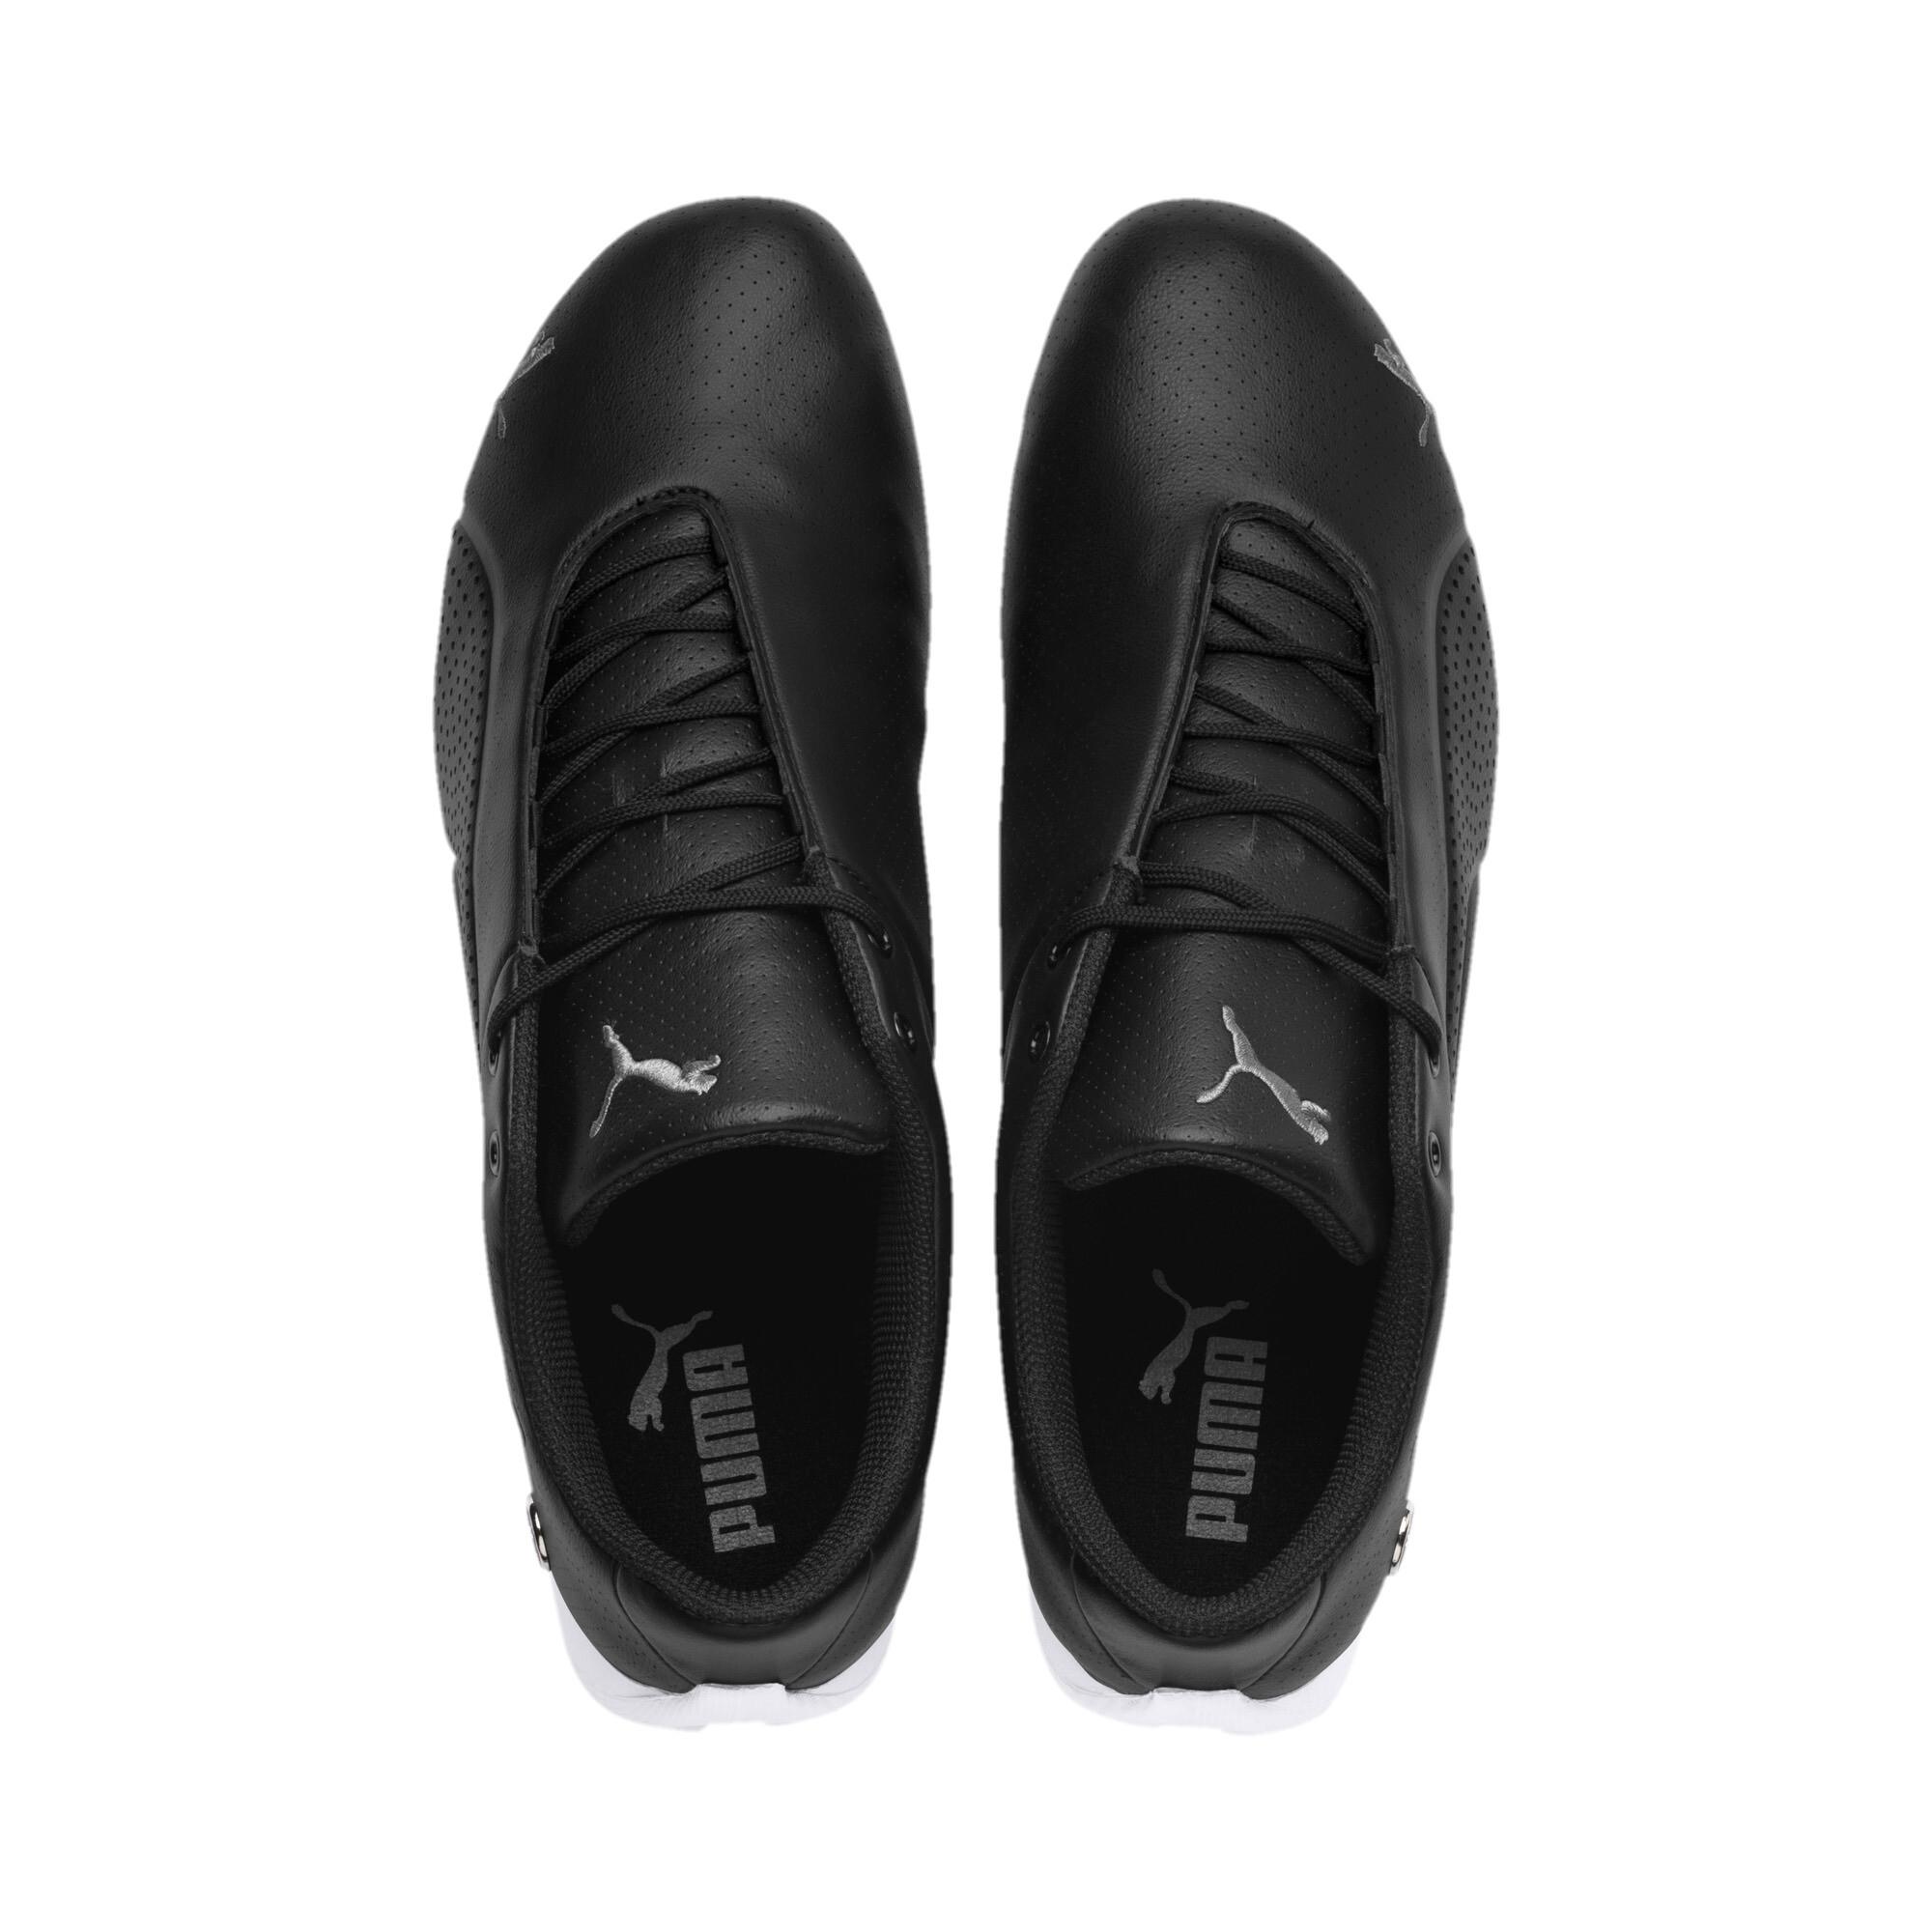 Indexbild 23 - PUMA BMW M Motorsport Future Cat Ultra Sneaker Unisex Schuhe Neu